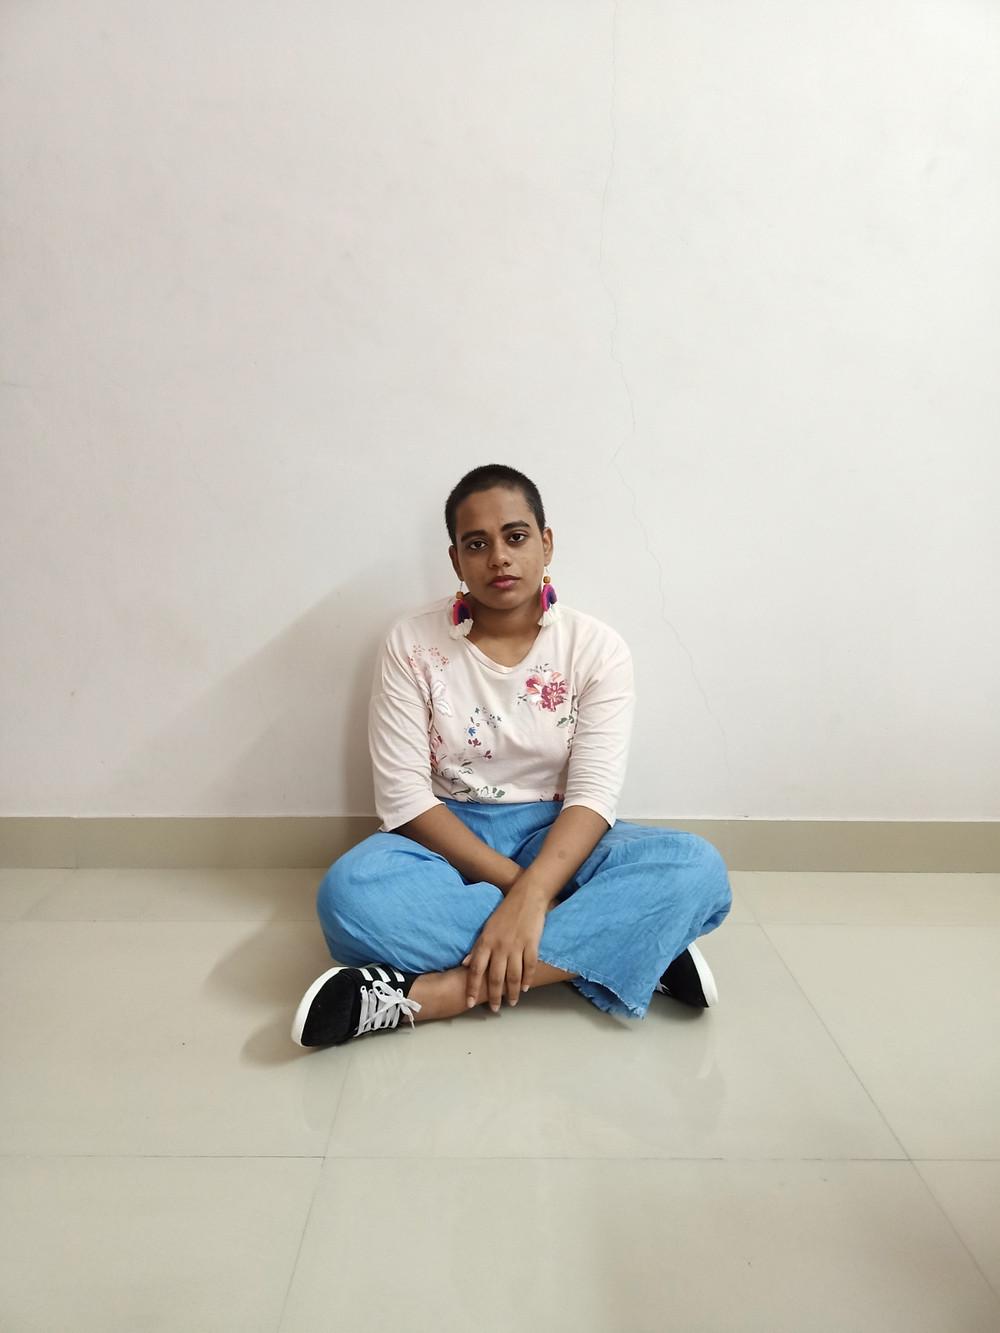 Feature writer and educator abha ahad